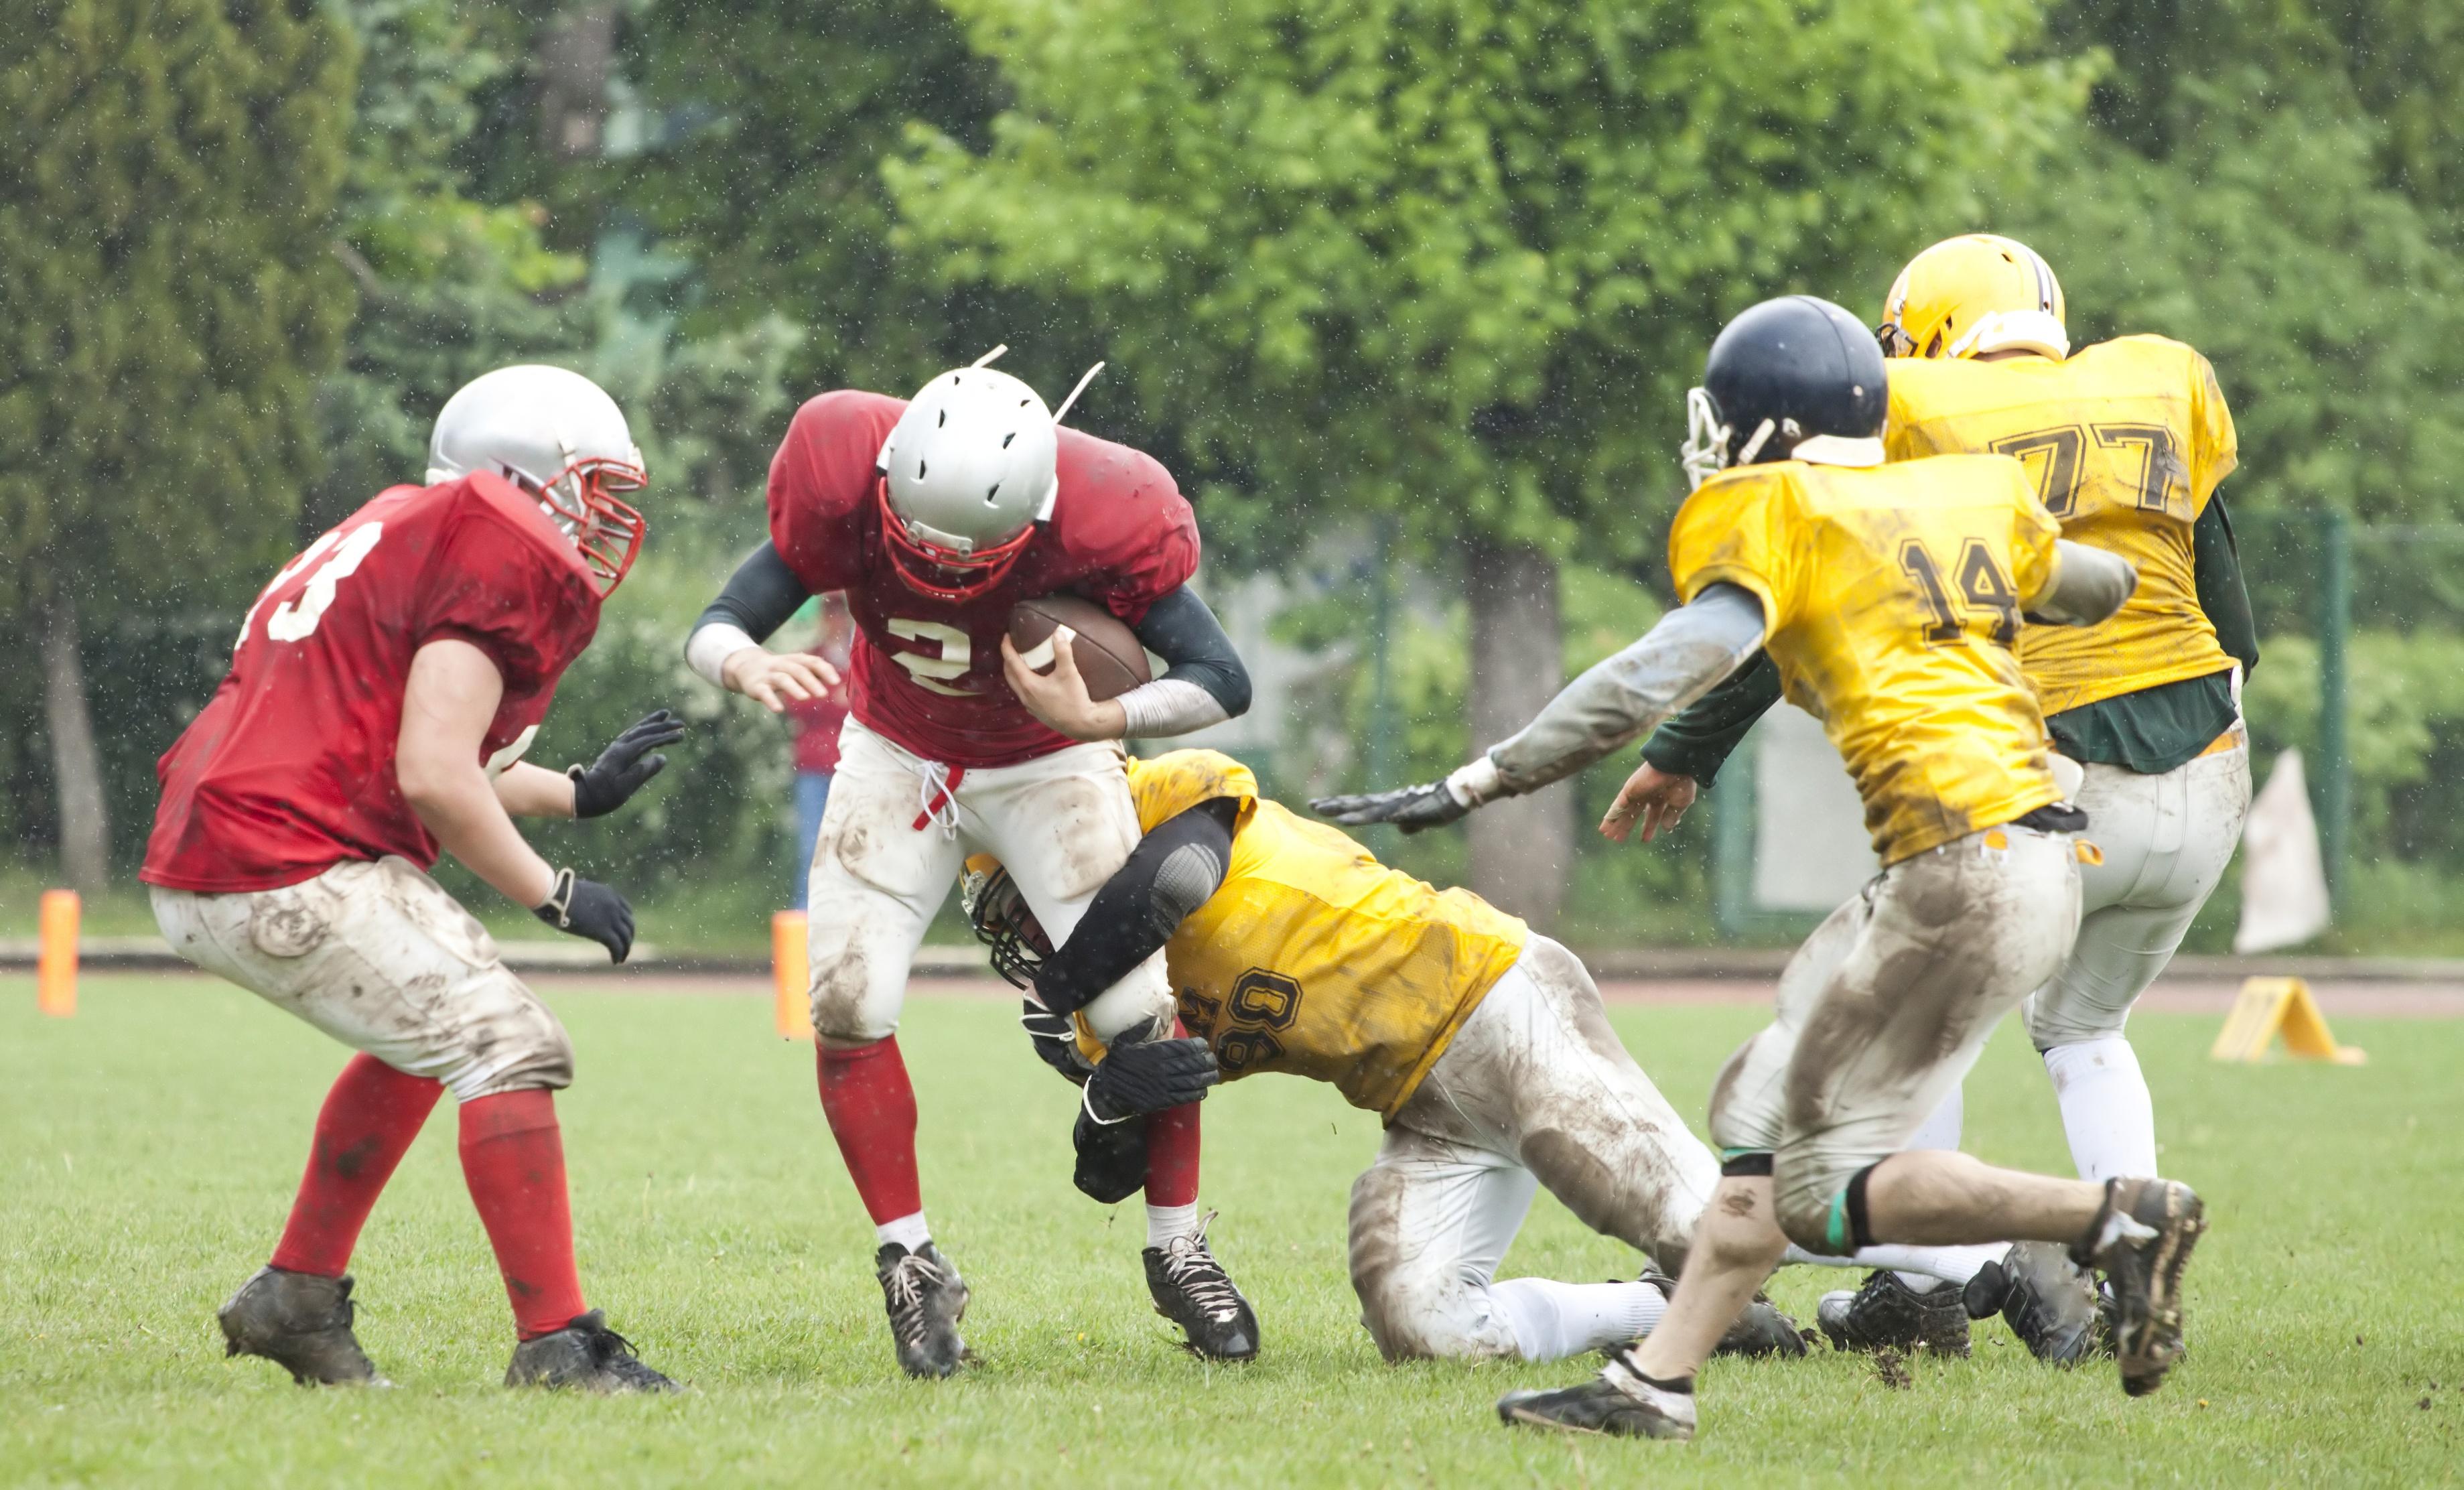 Common High School Football Injuries - Mueller Sports Medicine